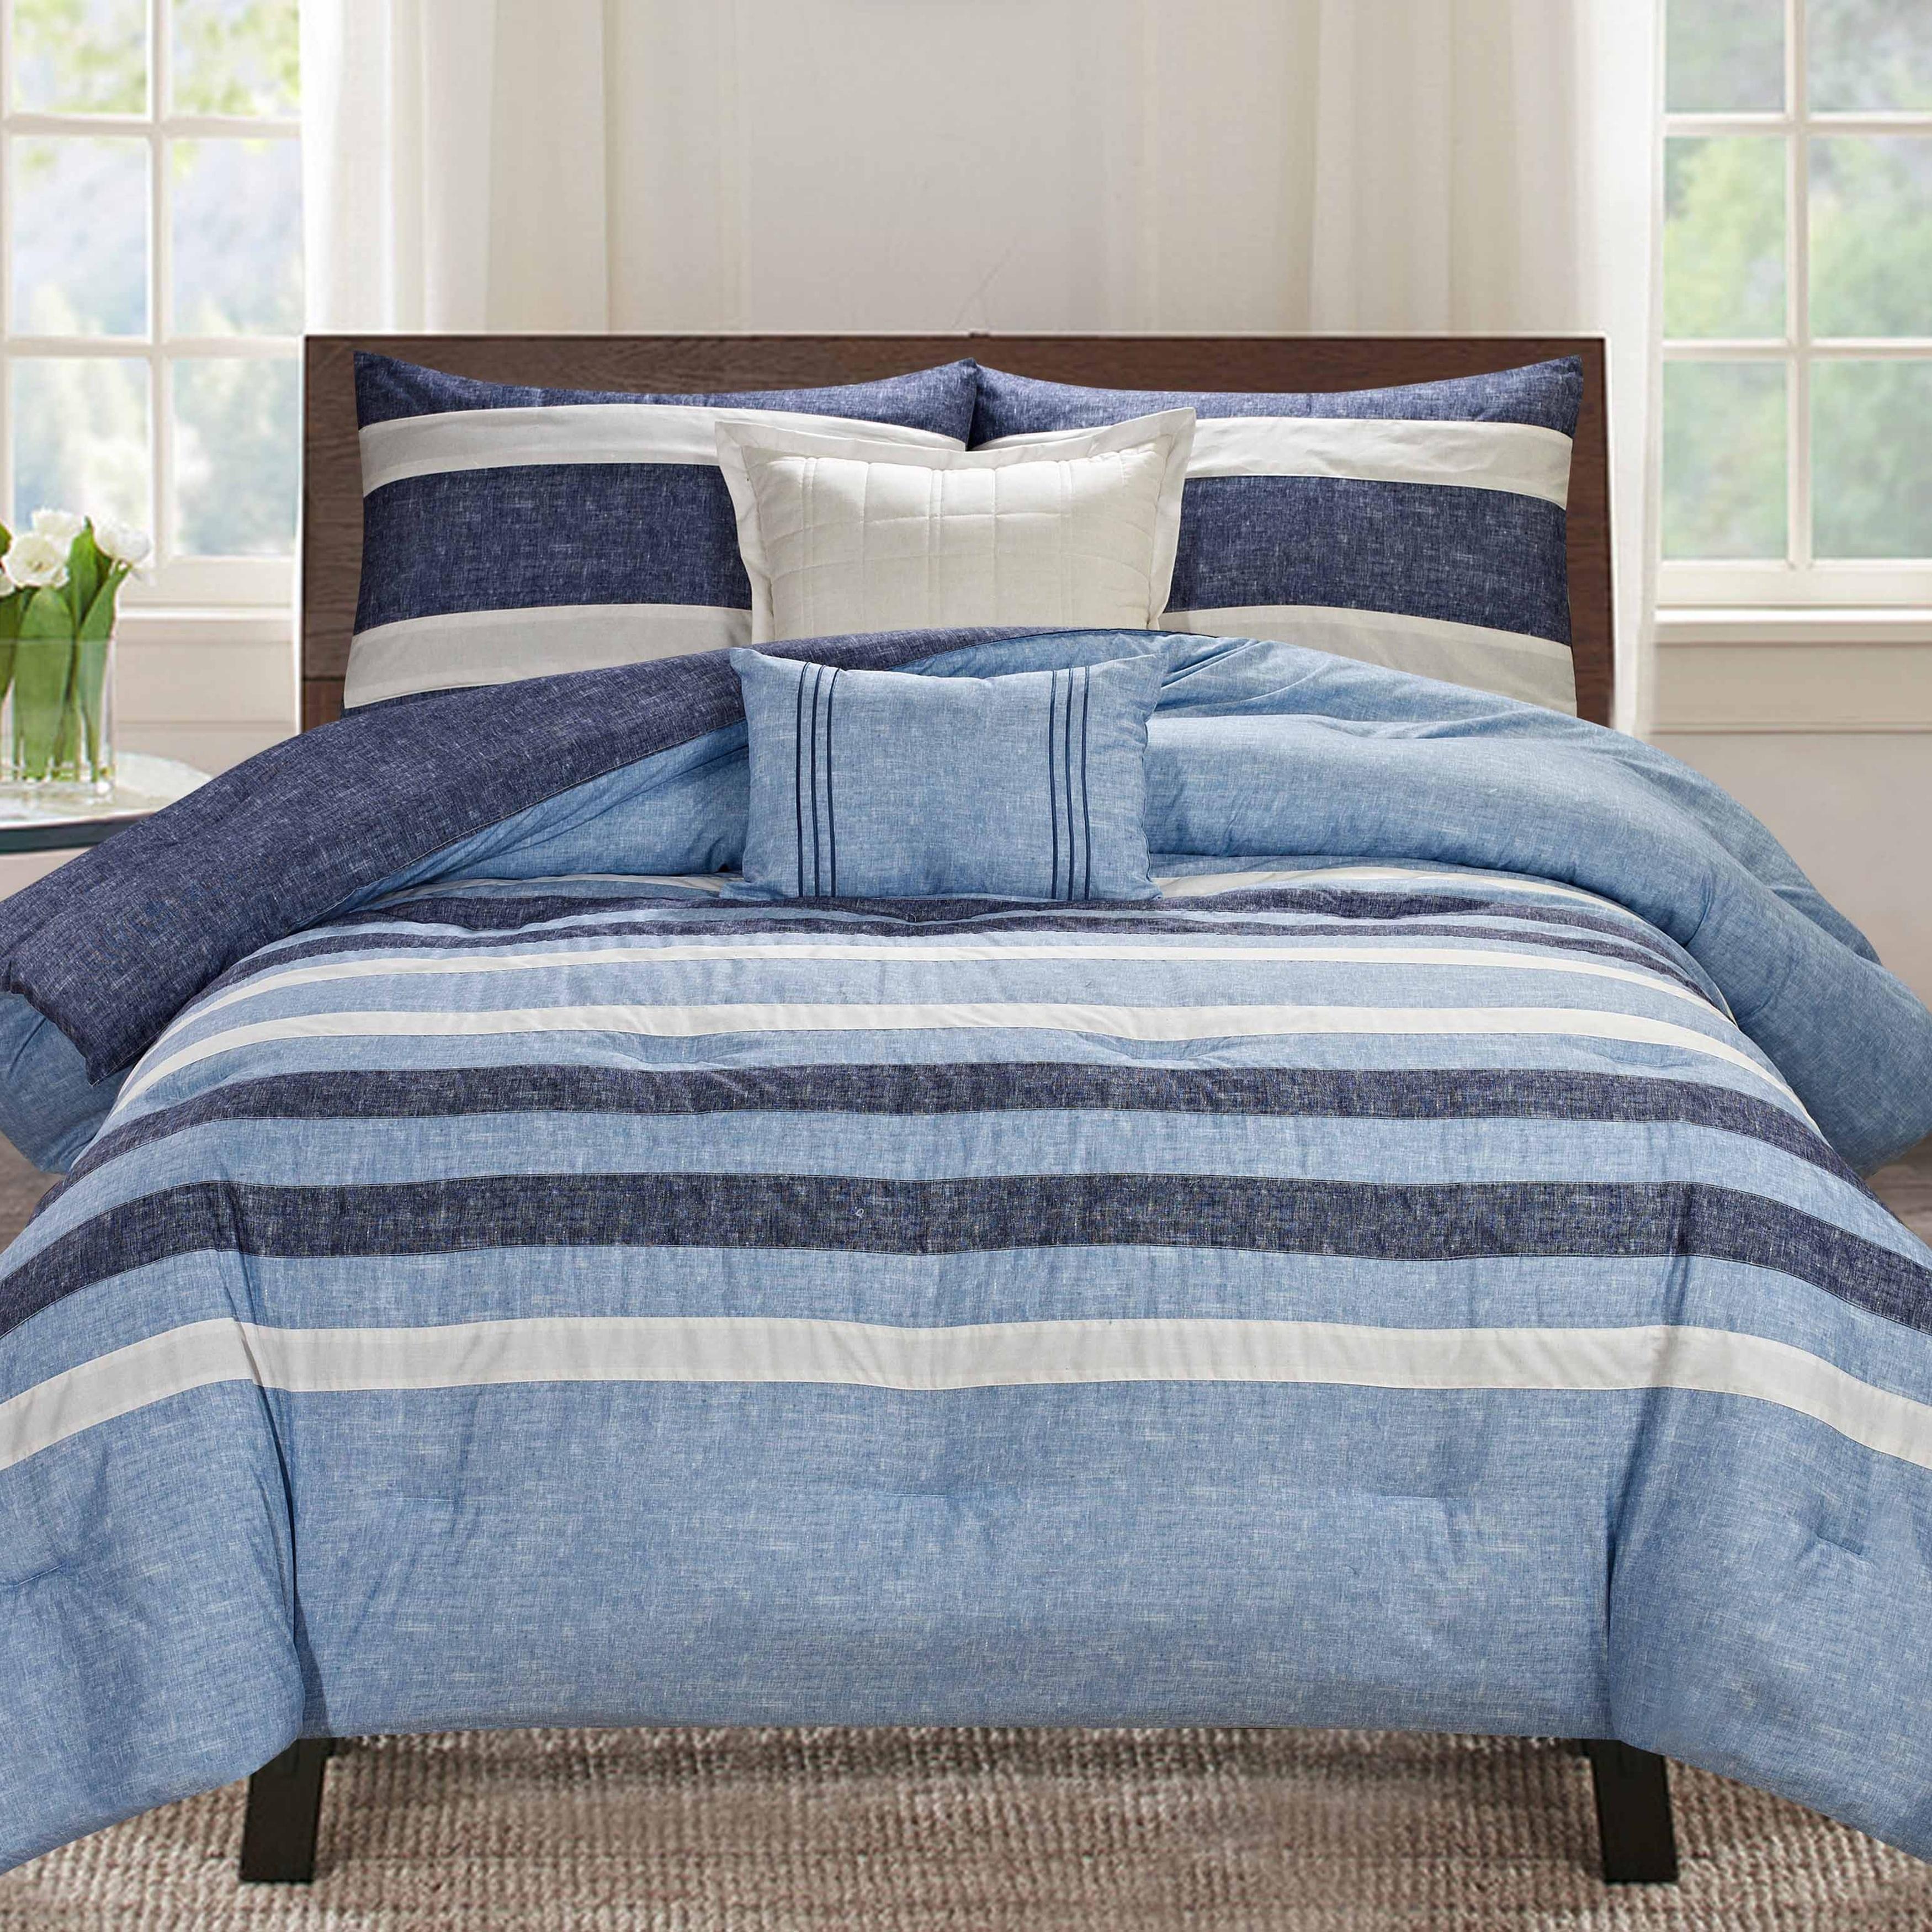 free set loft cfae bath piece bedding product today overstock cummins bed shipping stone com cotton cottage conrad carbon comforter